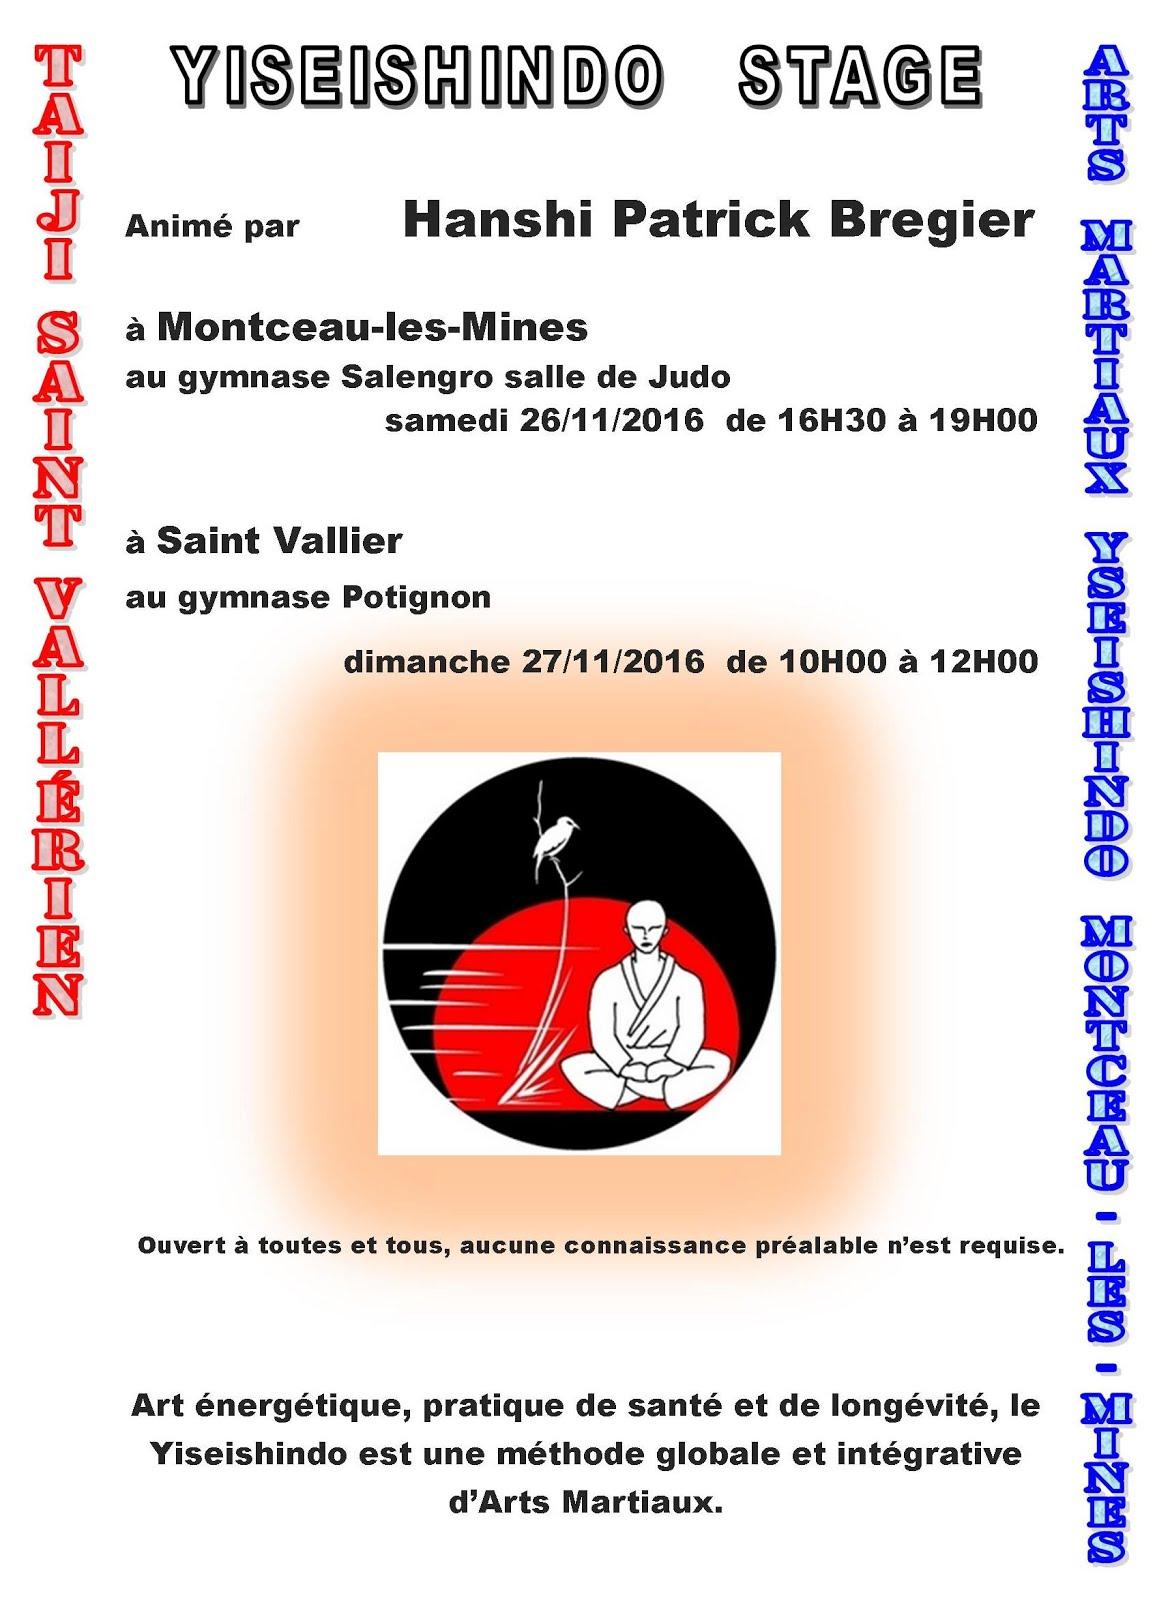 stage Yiseishindo Montceau/Saint Vallier